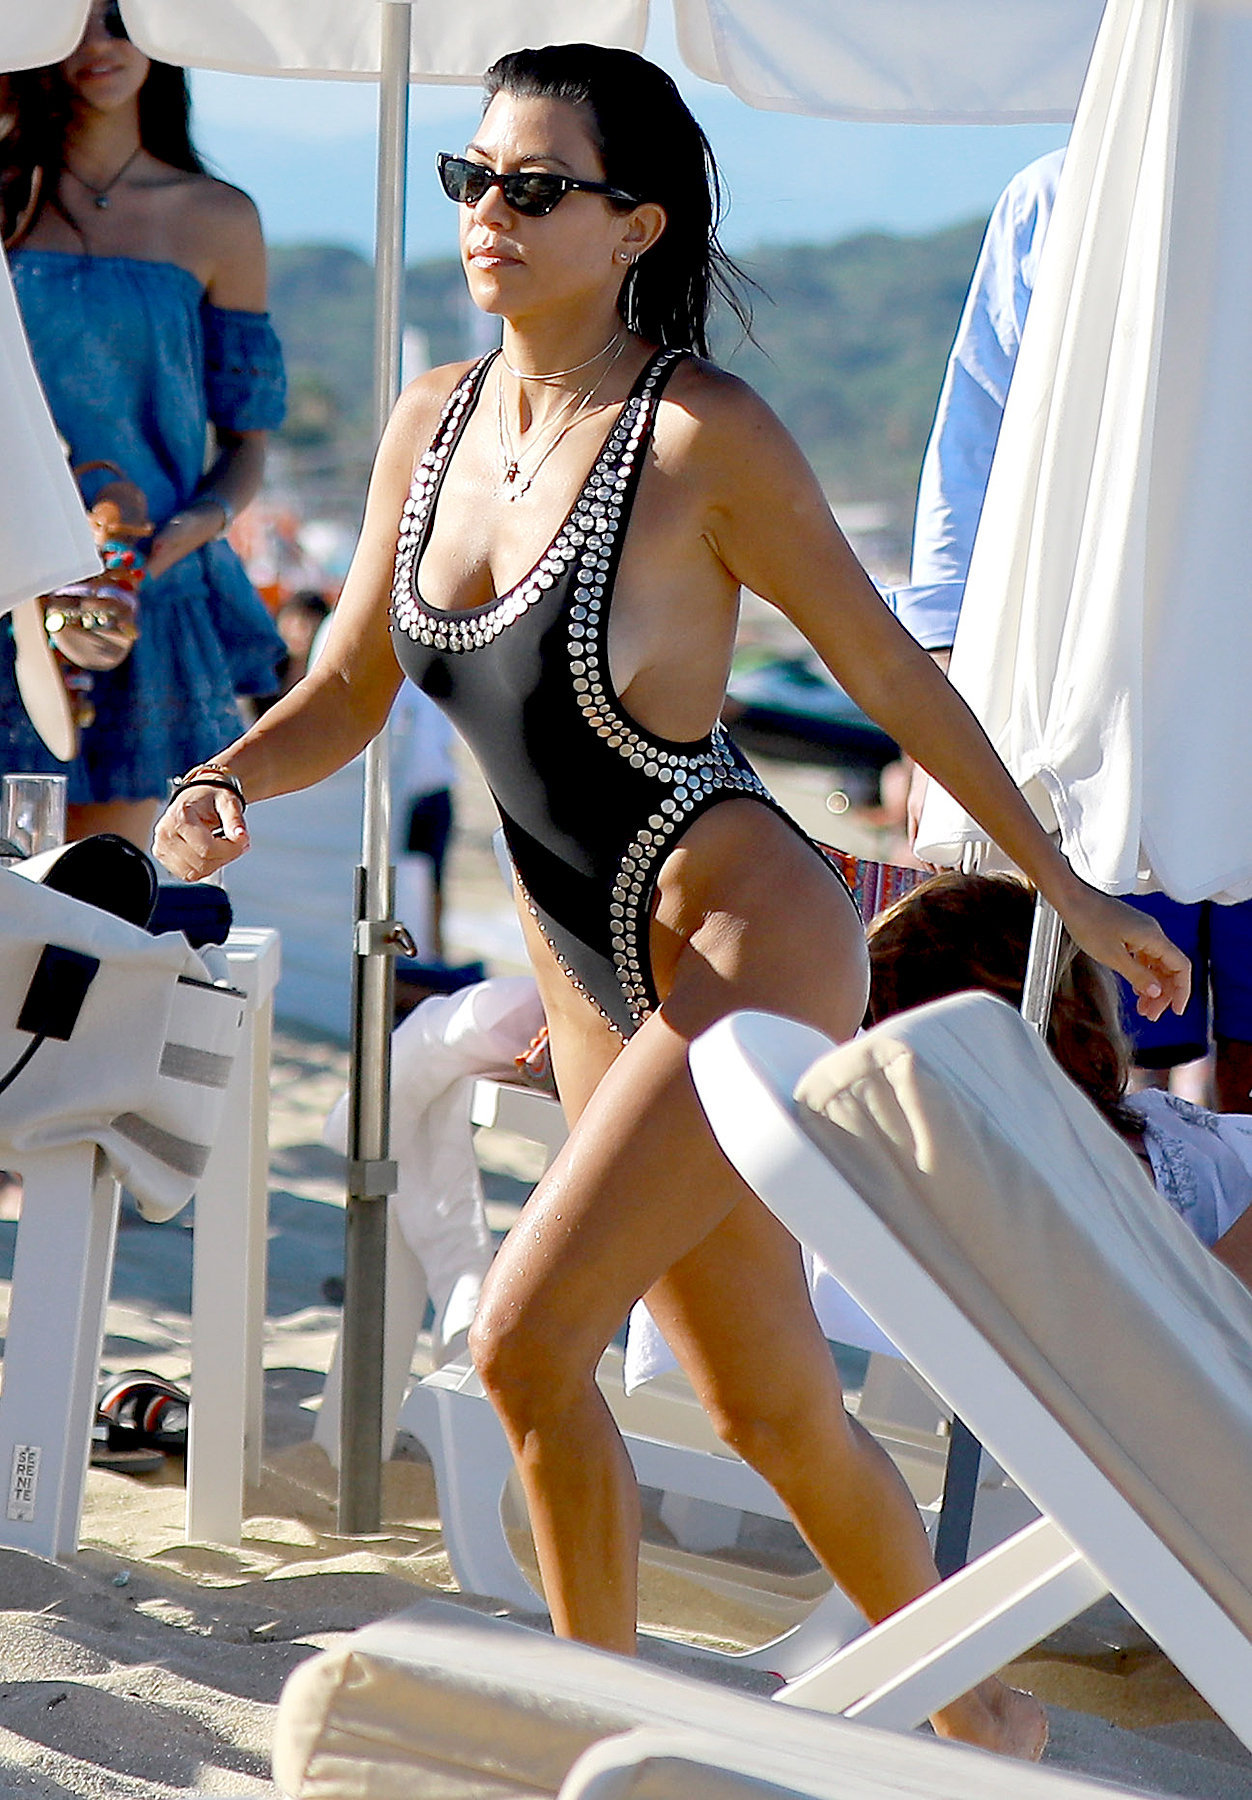 Kourtney Kardashian: Every Diet Trend and Tip She Has Tried